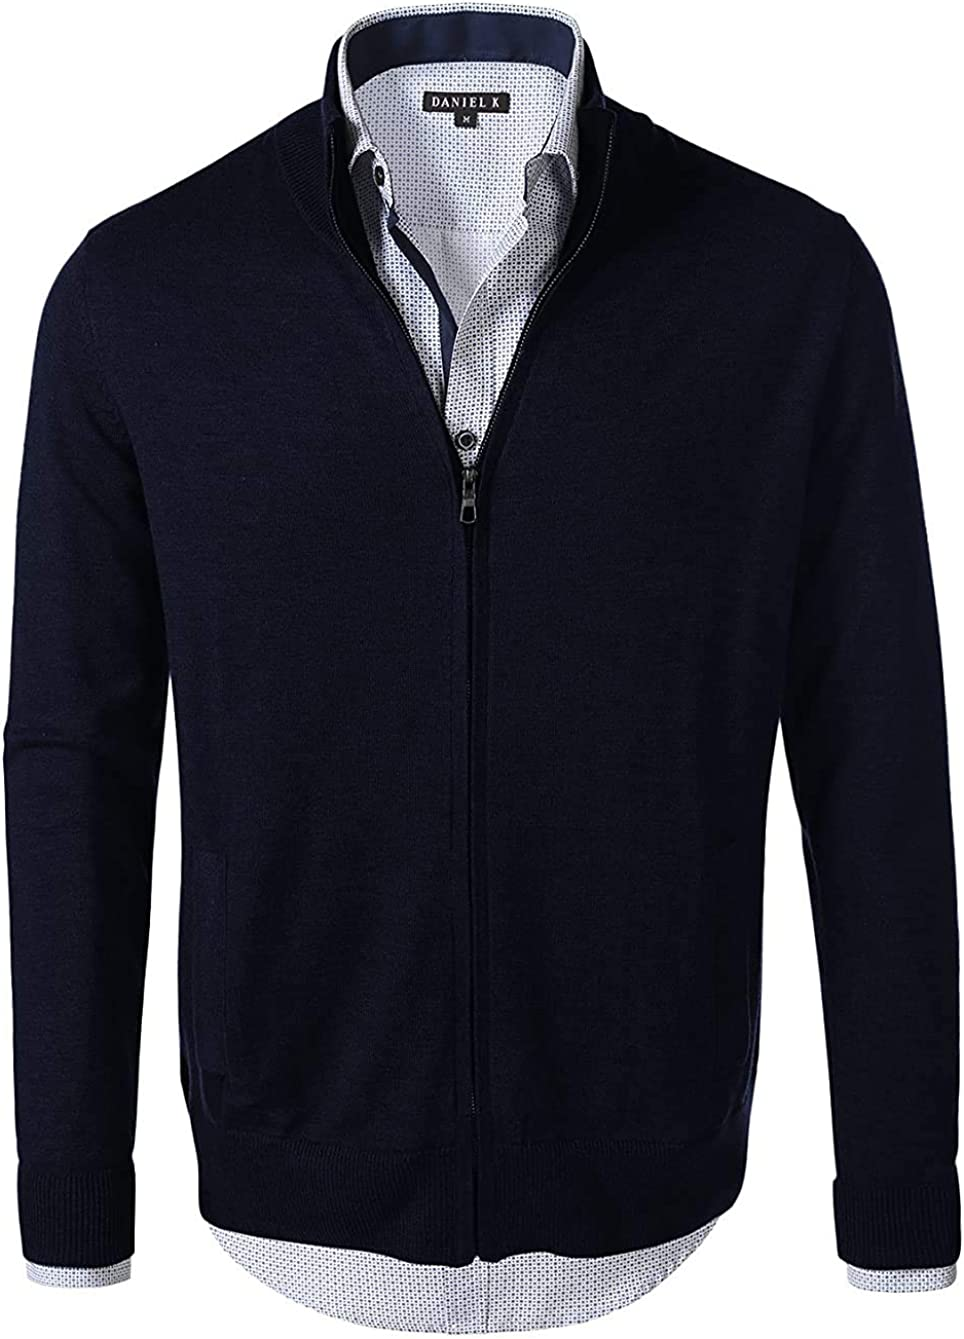 7 Encounter Men's Vintage Zipper Front Cardigan Sweater